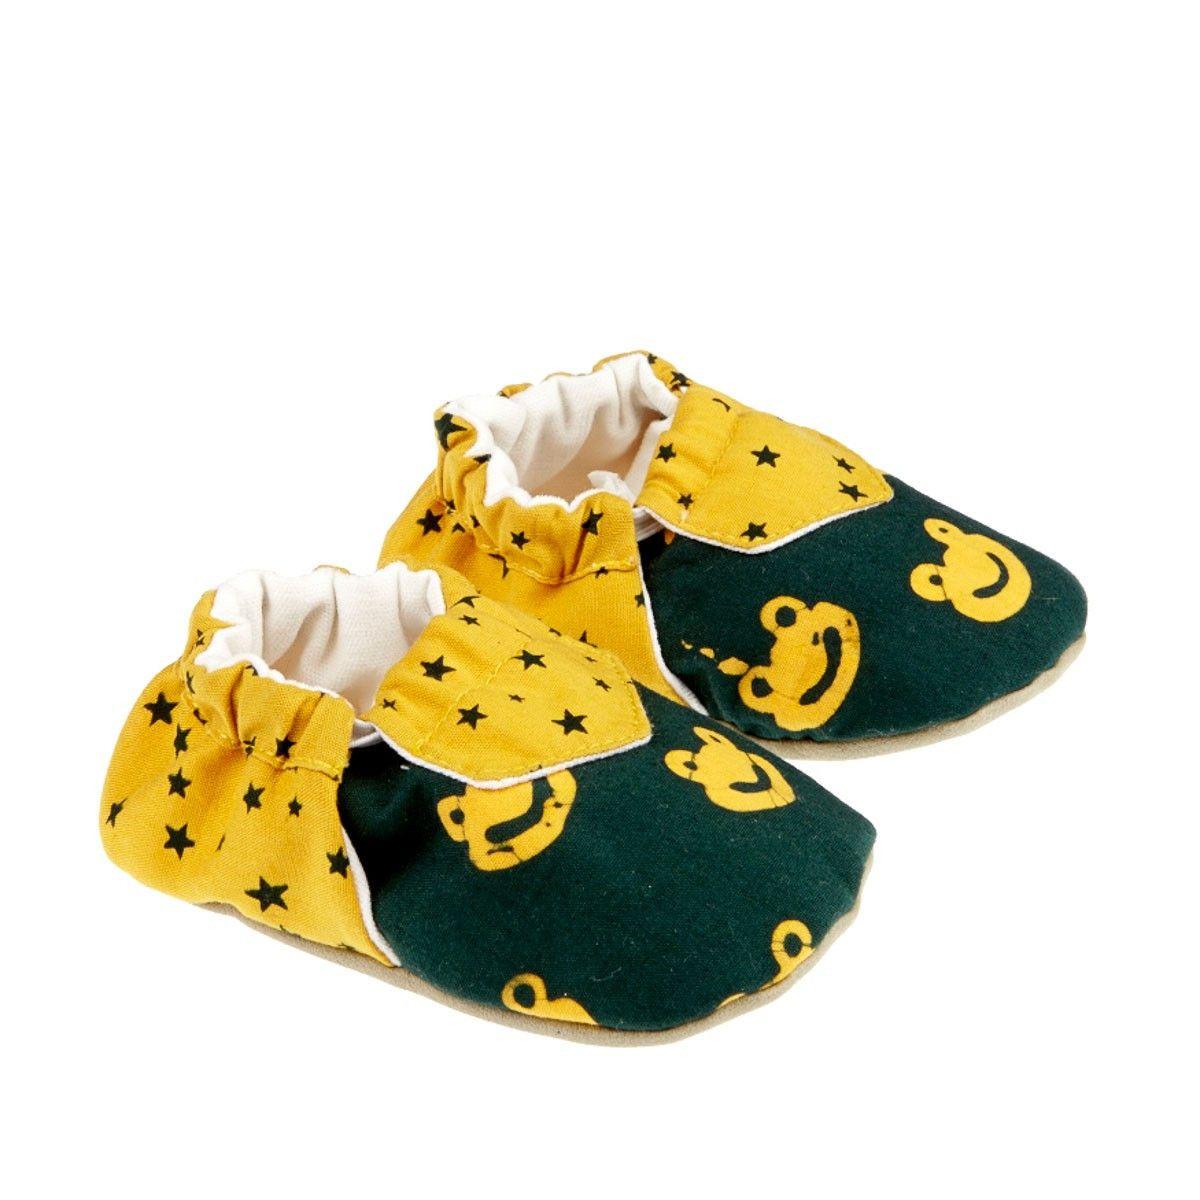 Chaussons bébé garçon souples